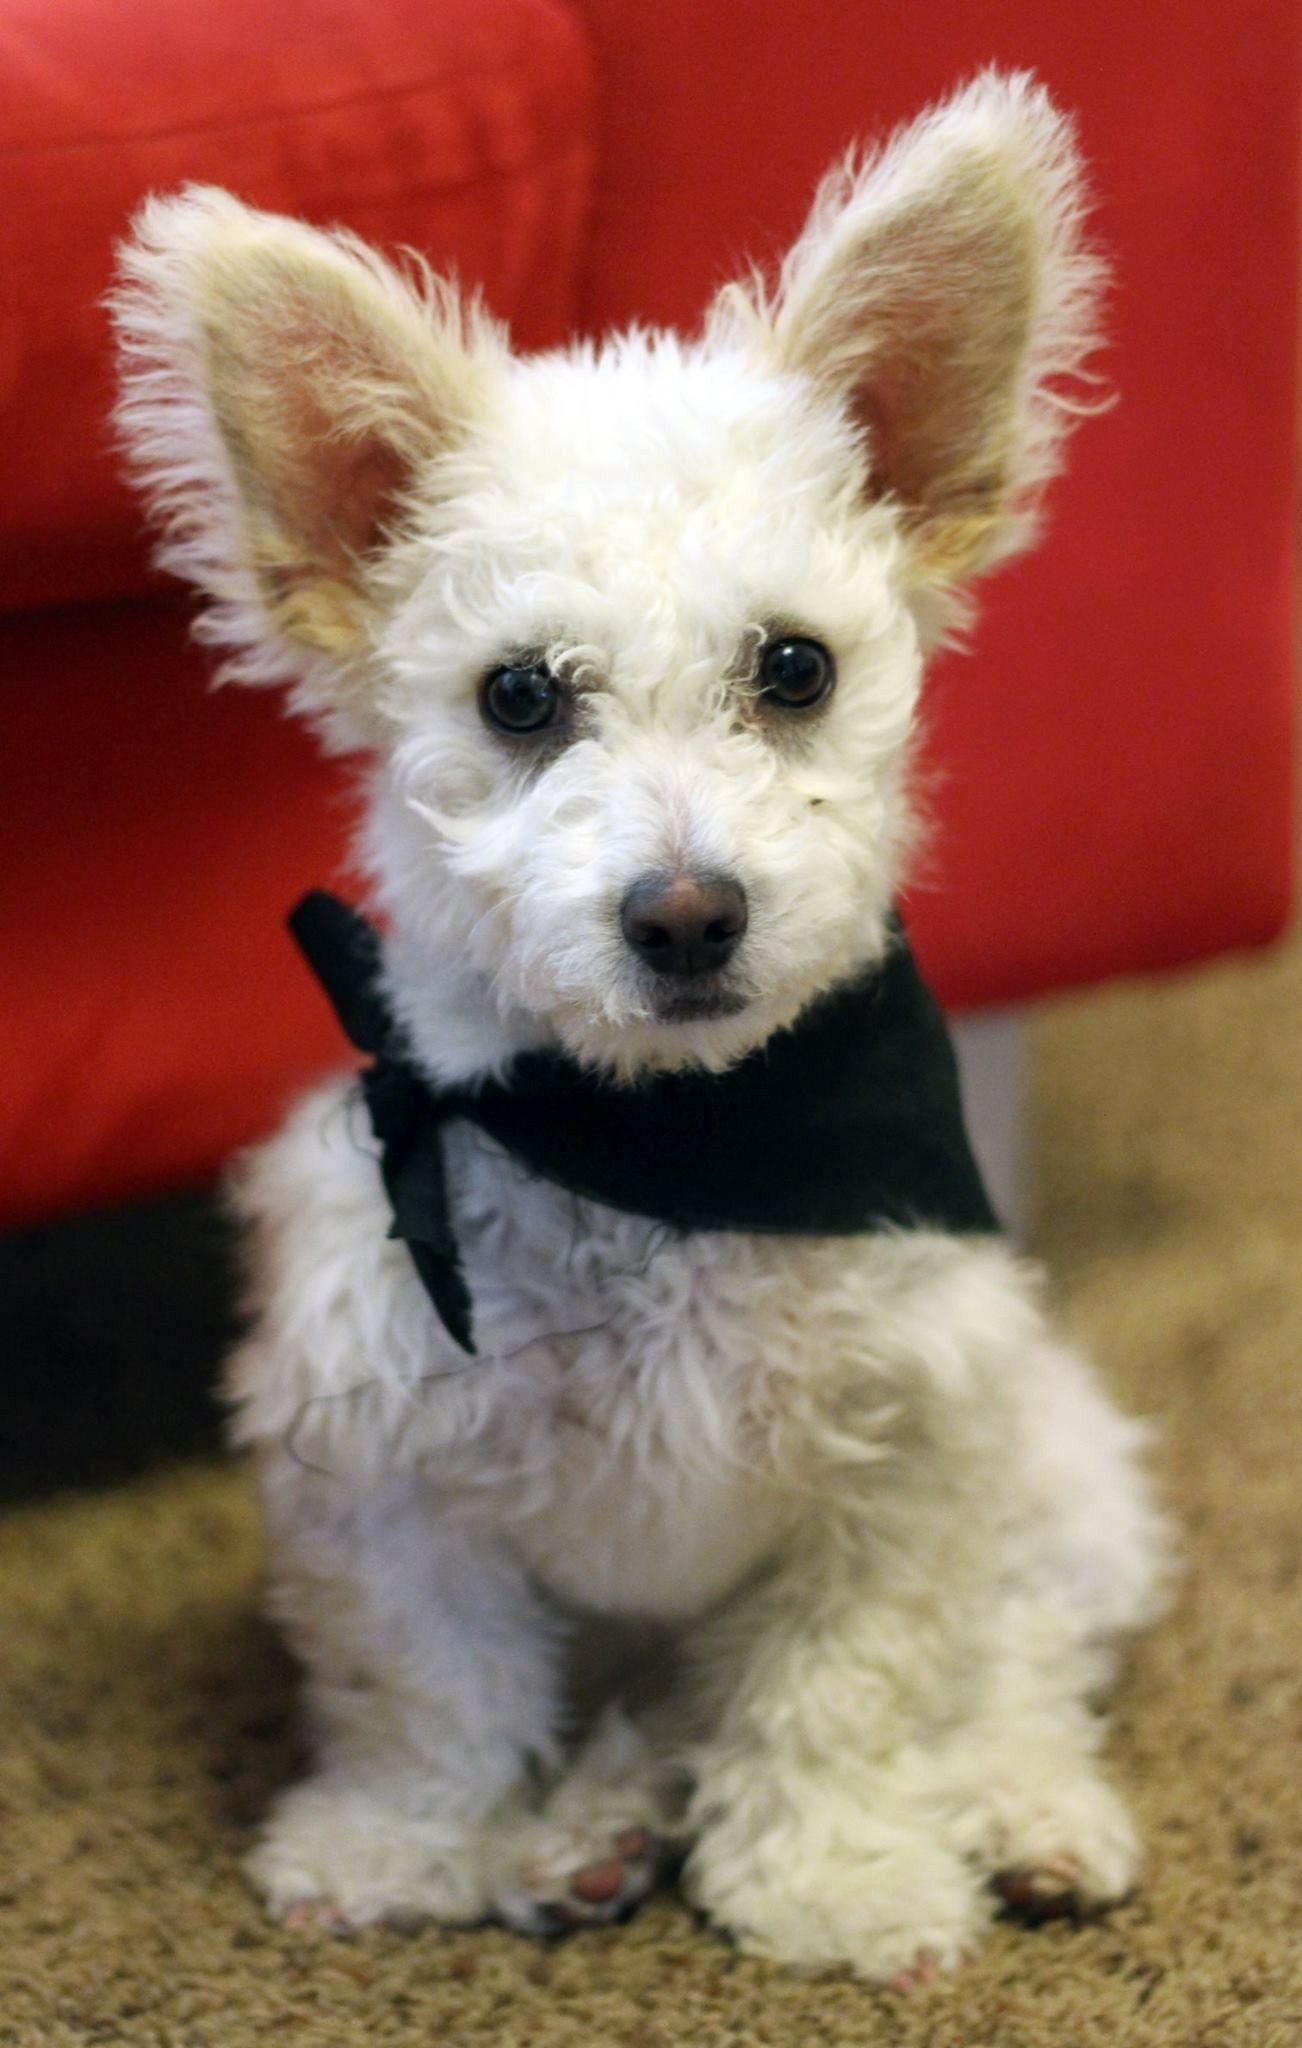 Corgi Poodle Puppy With Images Corgi Poodle